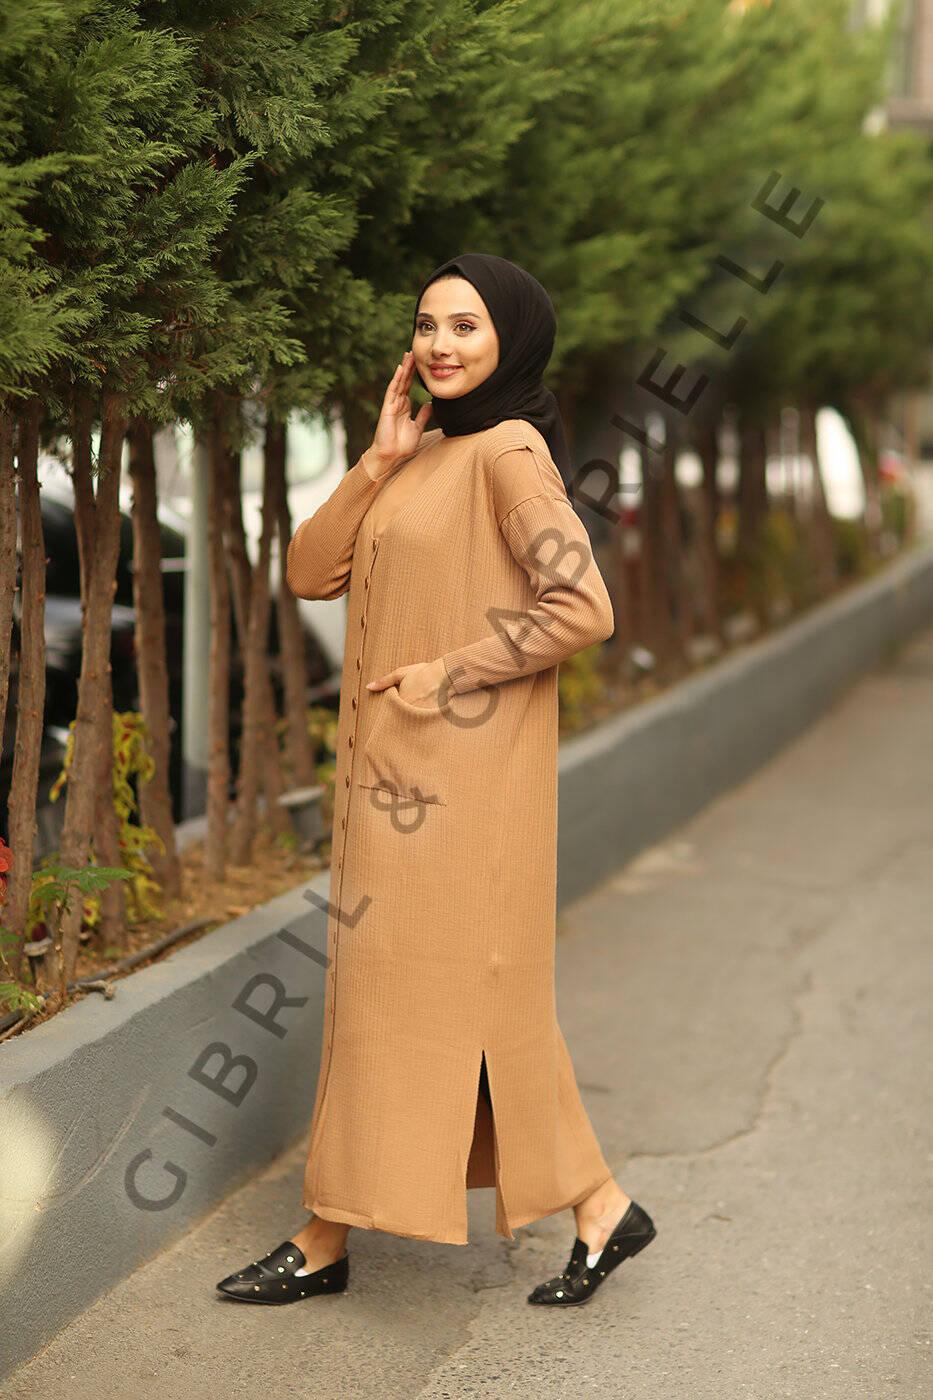 Ikra Knit Cardigan - Camel